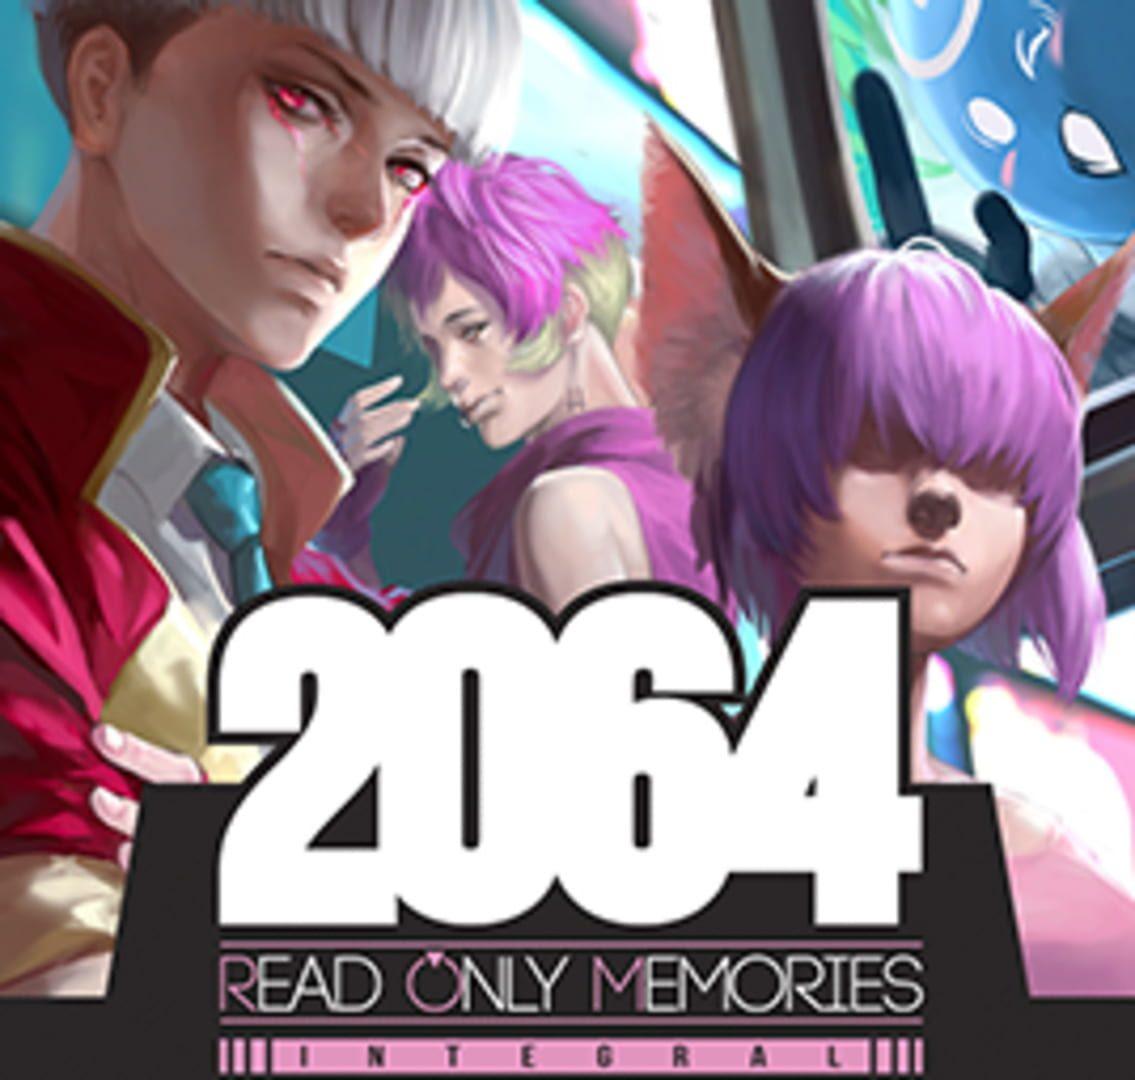 buy 2064: Read Only Memories INTEGRAL cd key for pc platform